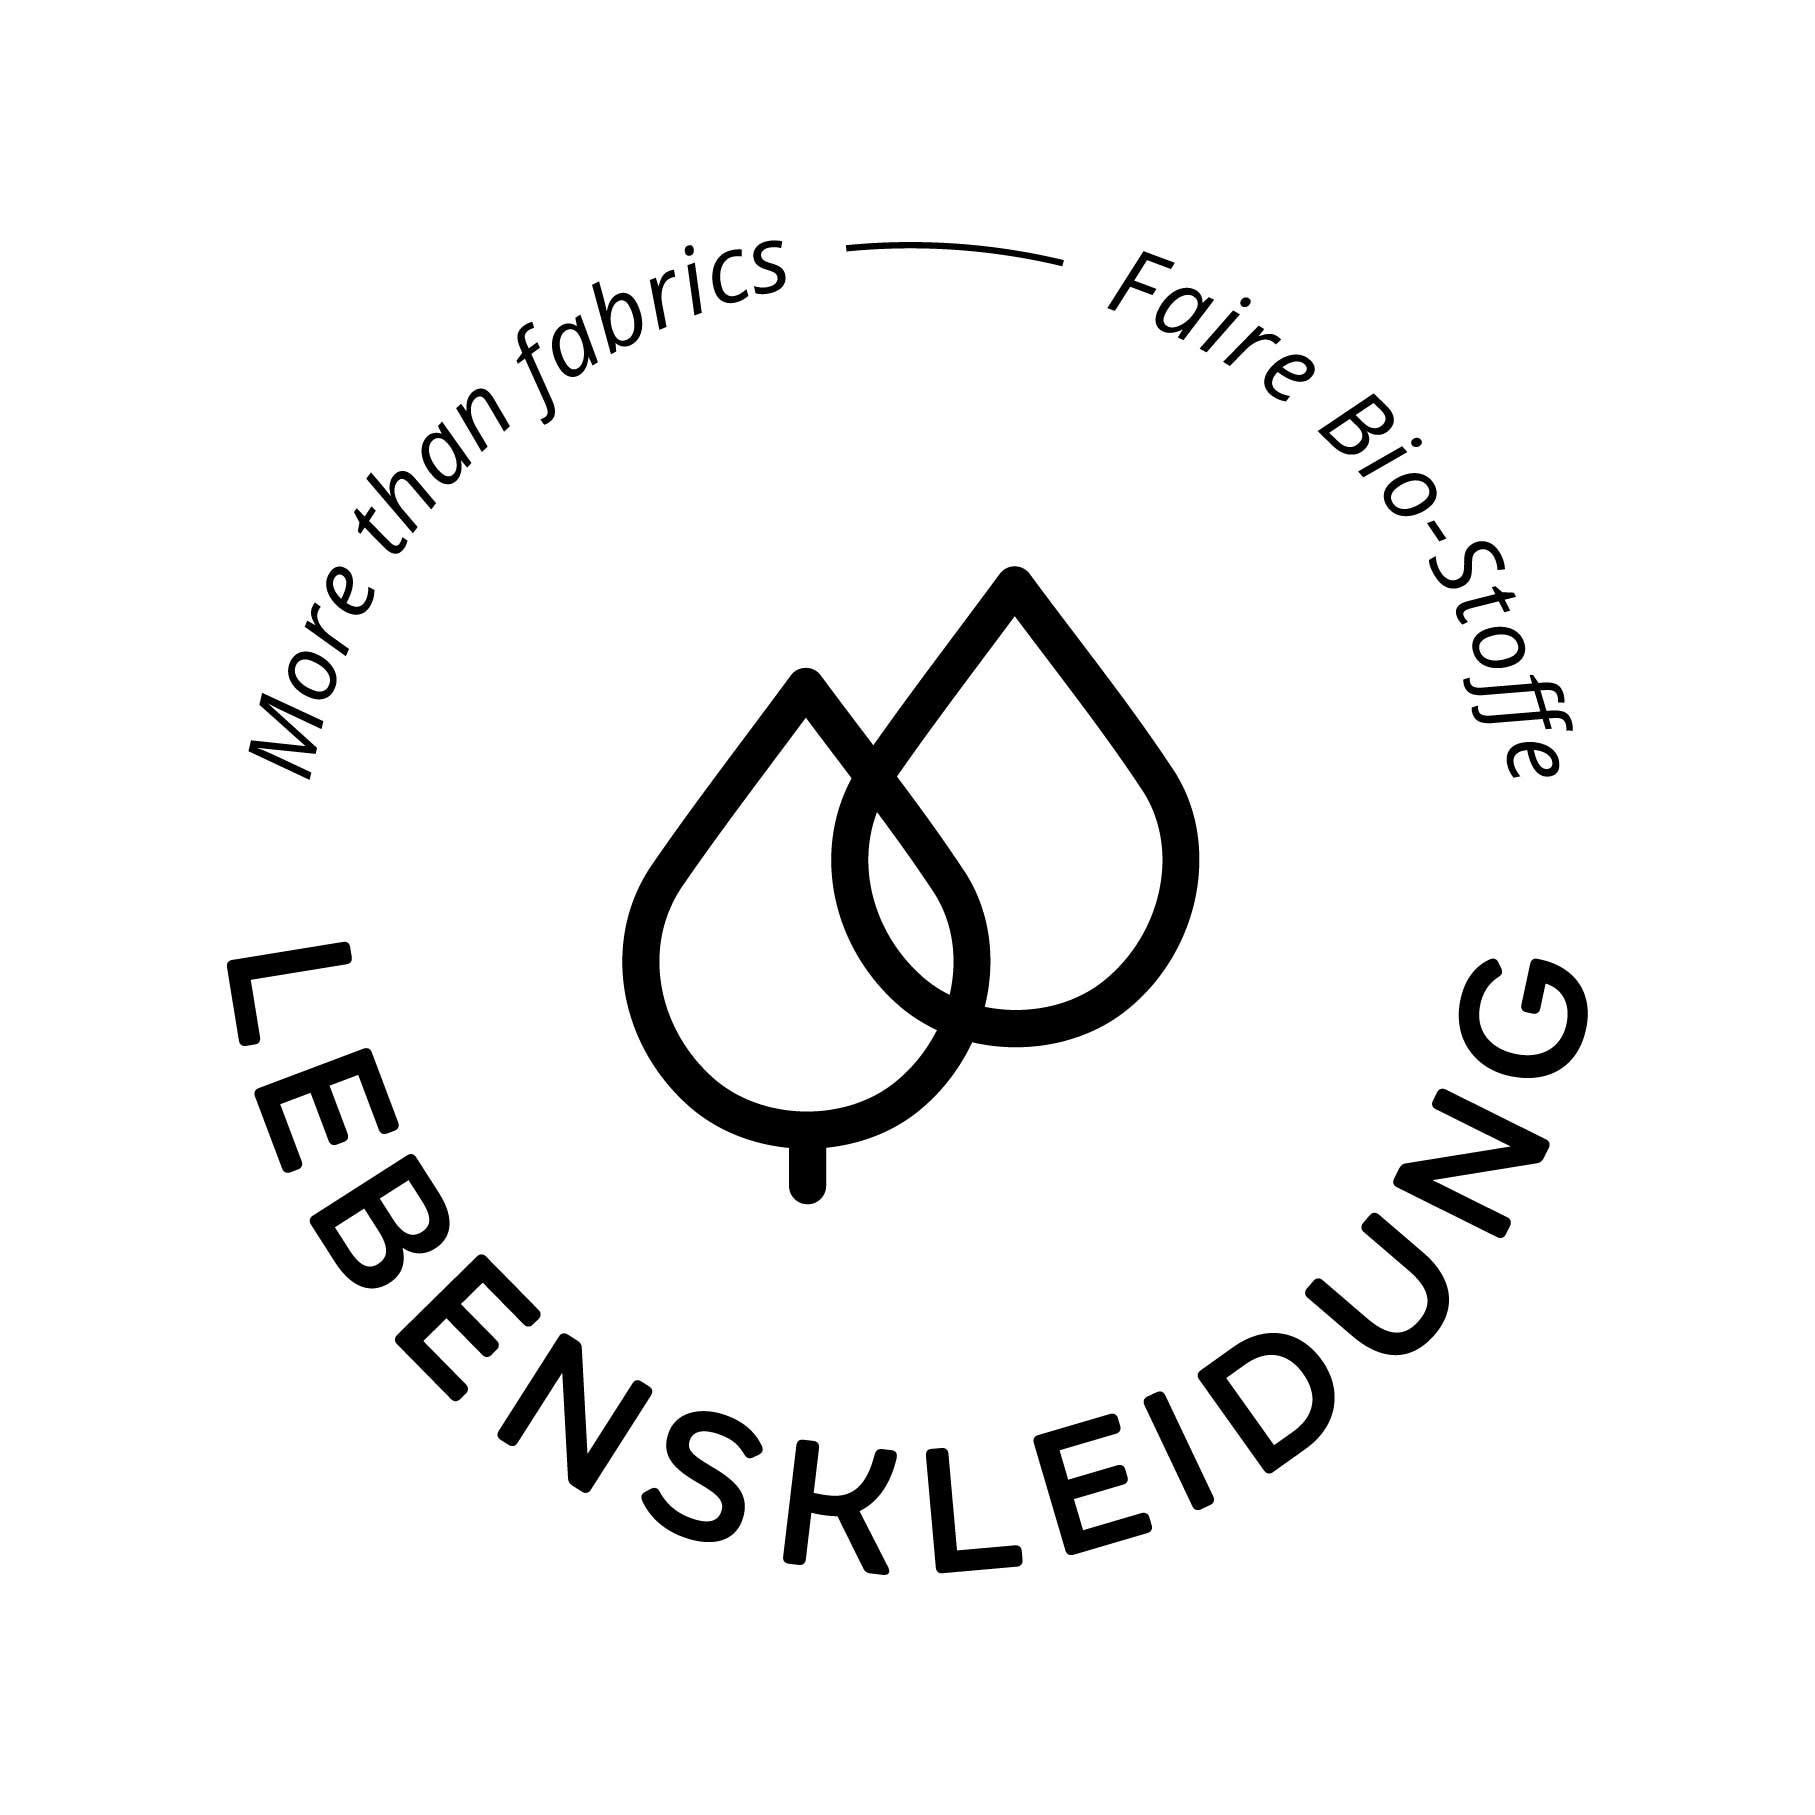 Bio Tissu RIB 2x1 (manchette) - gris grisonnante - foncé